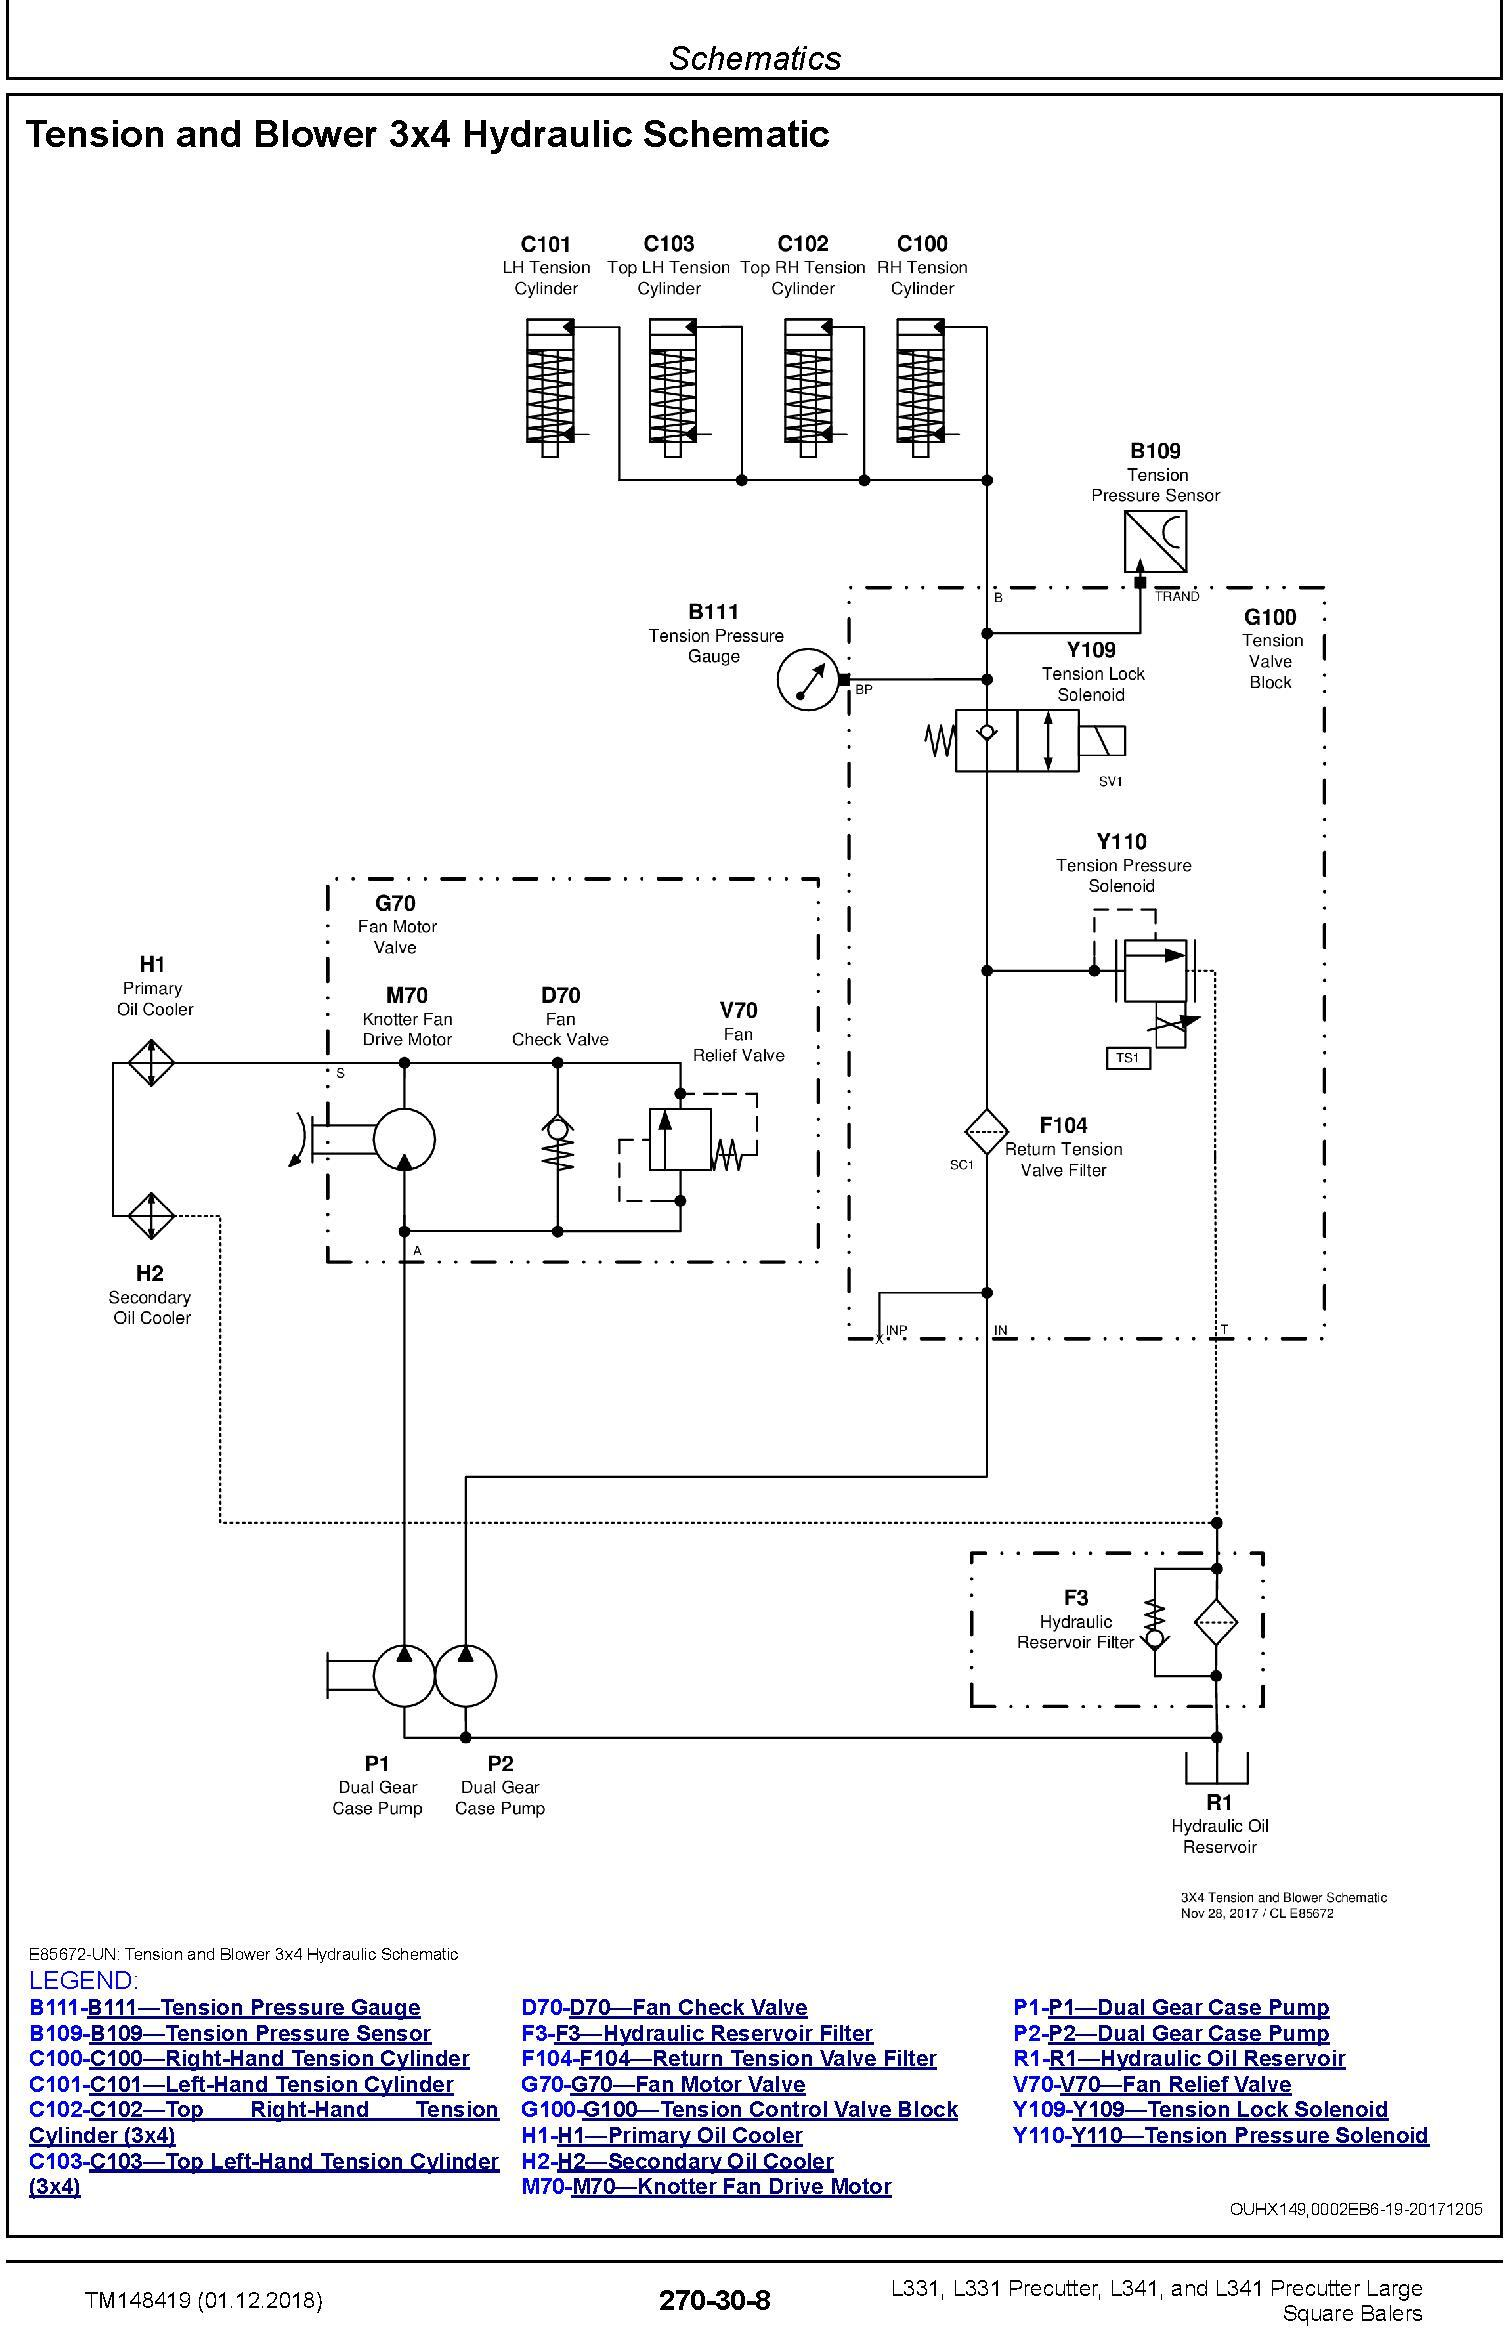 JD John Deere L331/Precutter, L341/ Precutter Large Square Balers Repair Technical Manual (TM148419) - 3